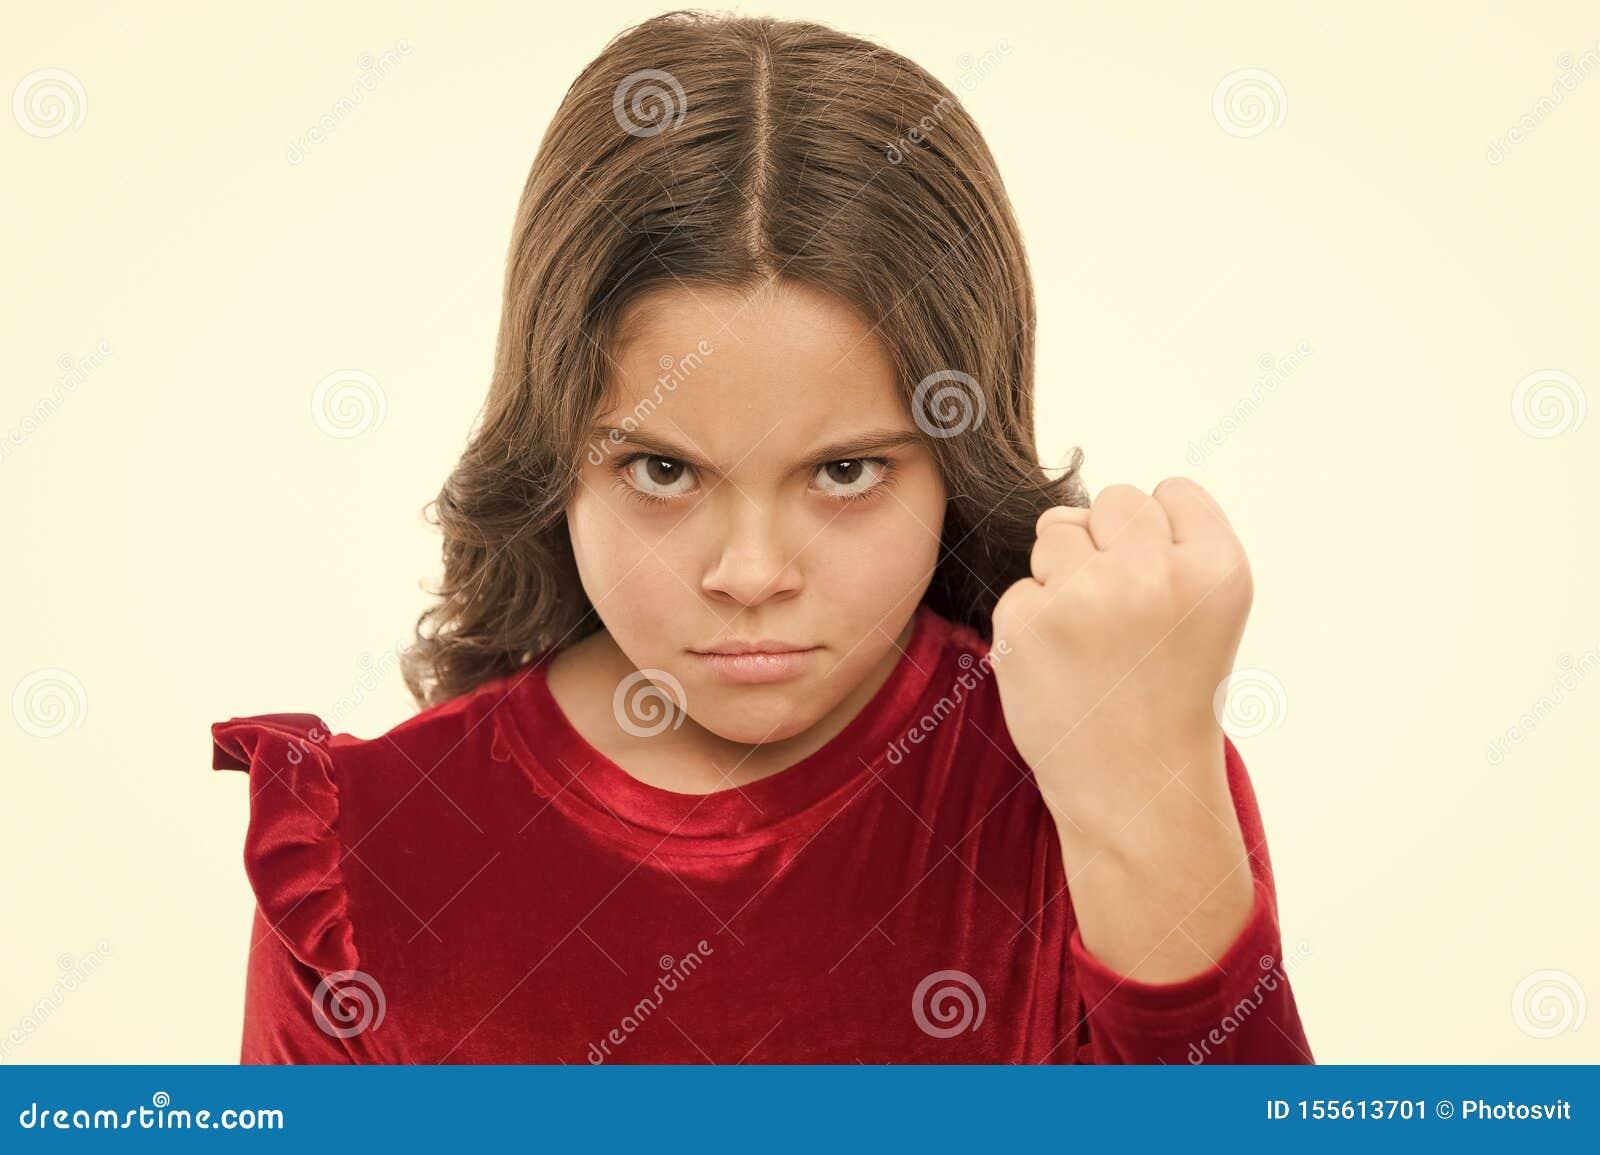 Amea?a com o ataque f?sico Ca?oa o conceito da agress?o Menina agressiva que amea?a bat?-lo Menina perigosa voc?